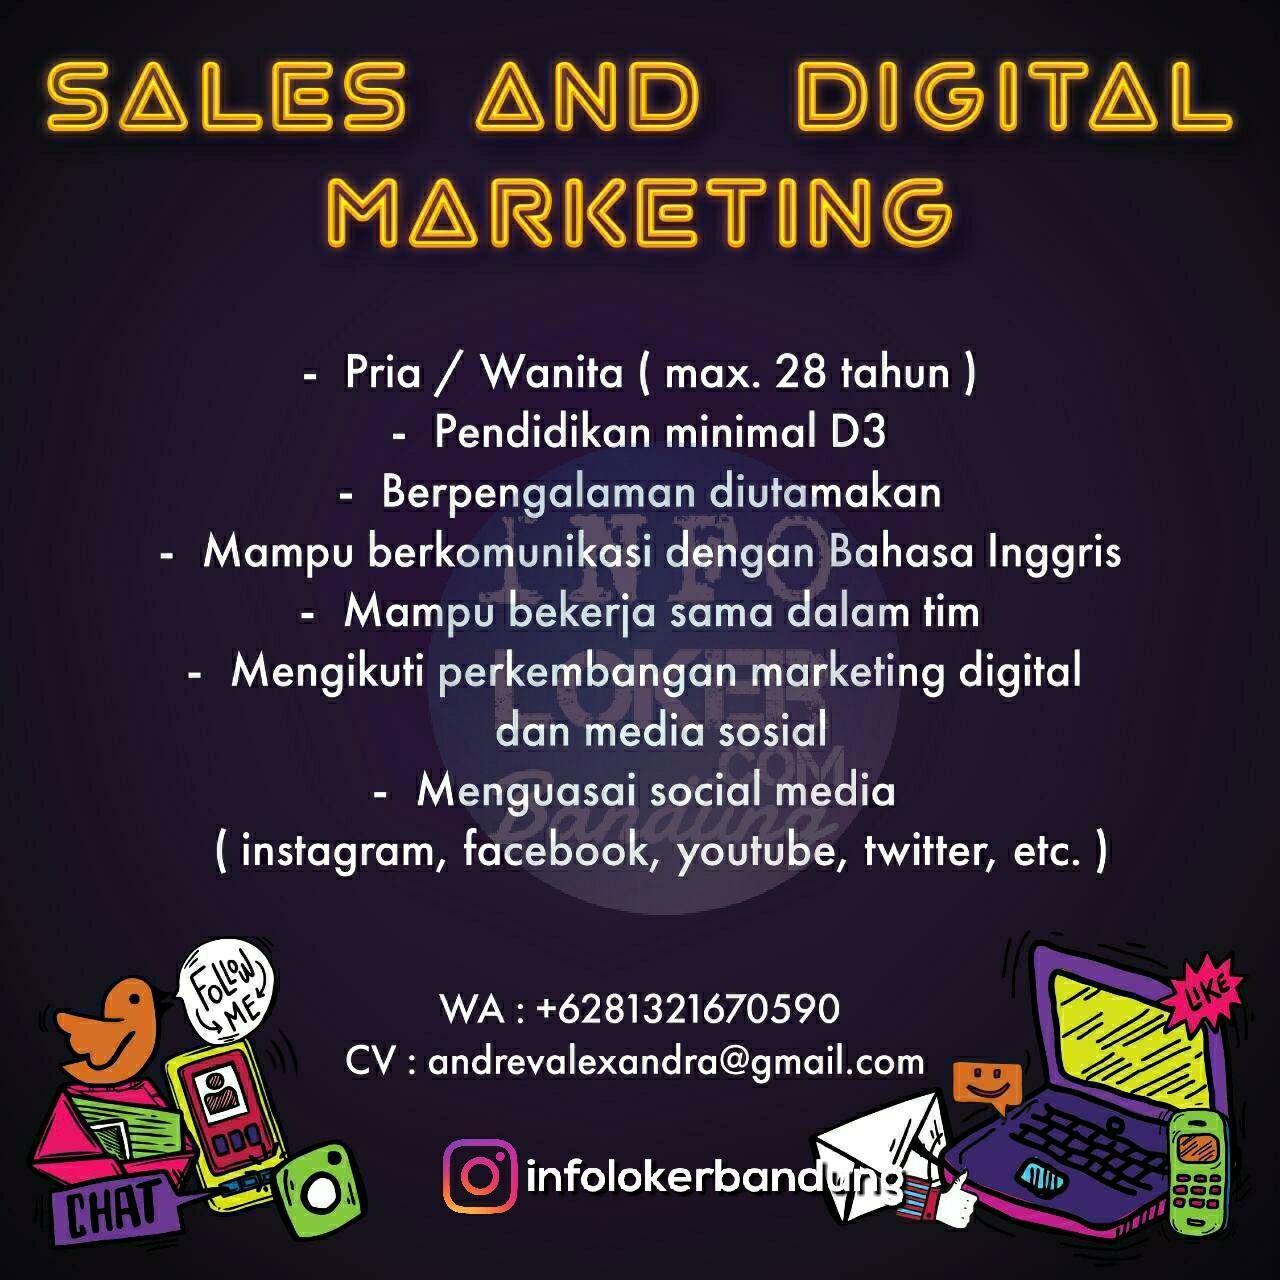 We are Hiring Sales and Digital Marketing In Bandung